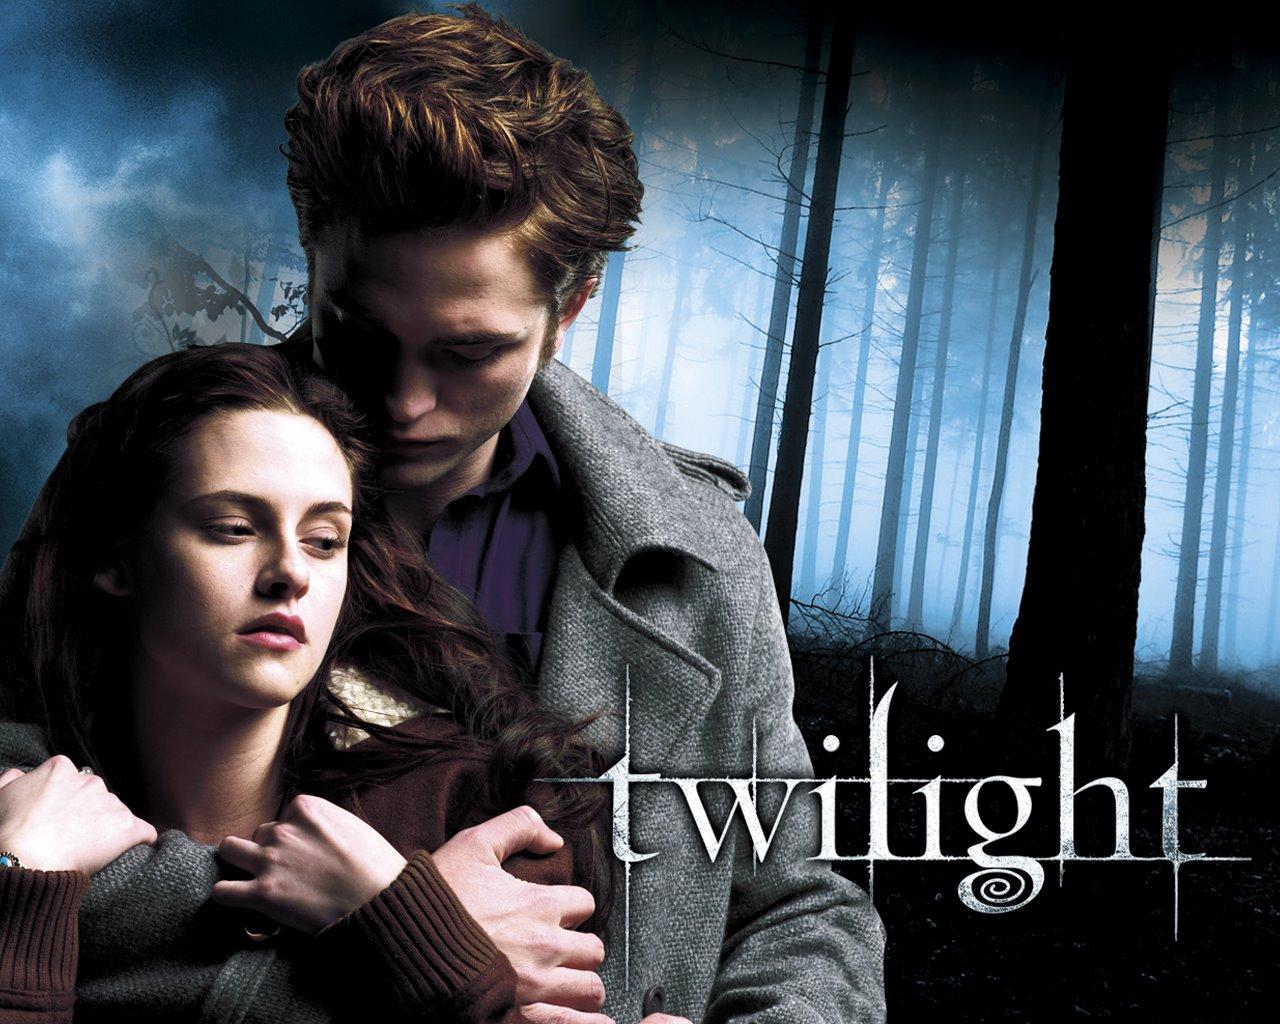 image - twilight download | twilight saga wiki | fandom powered